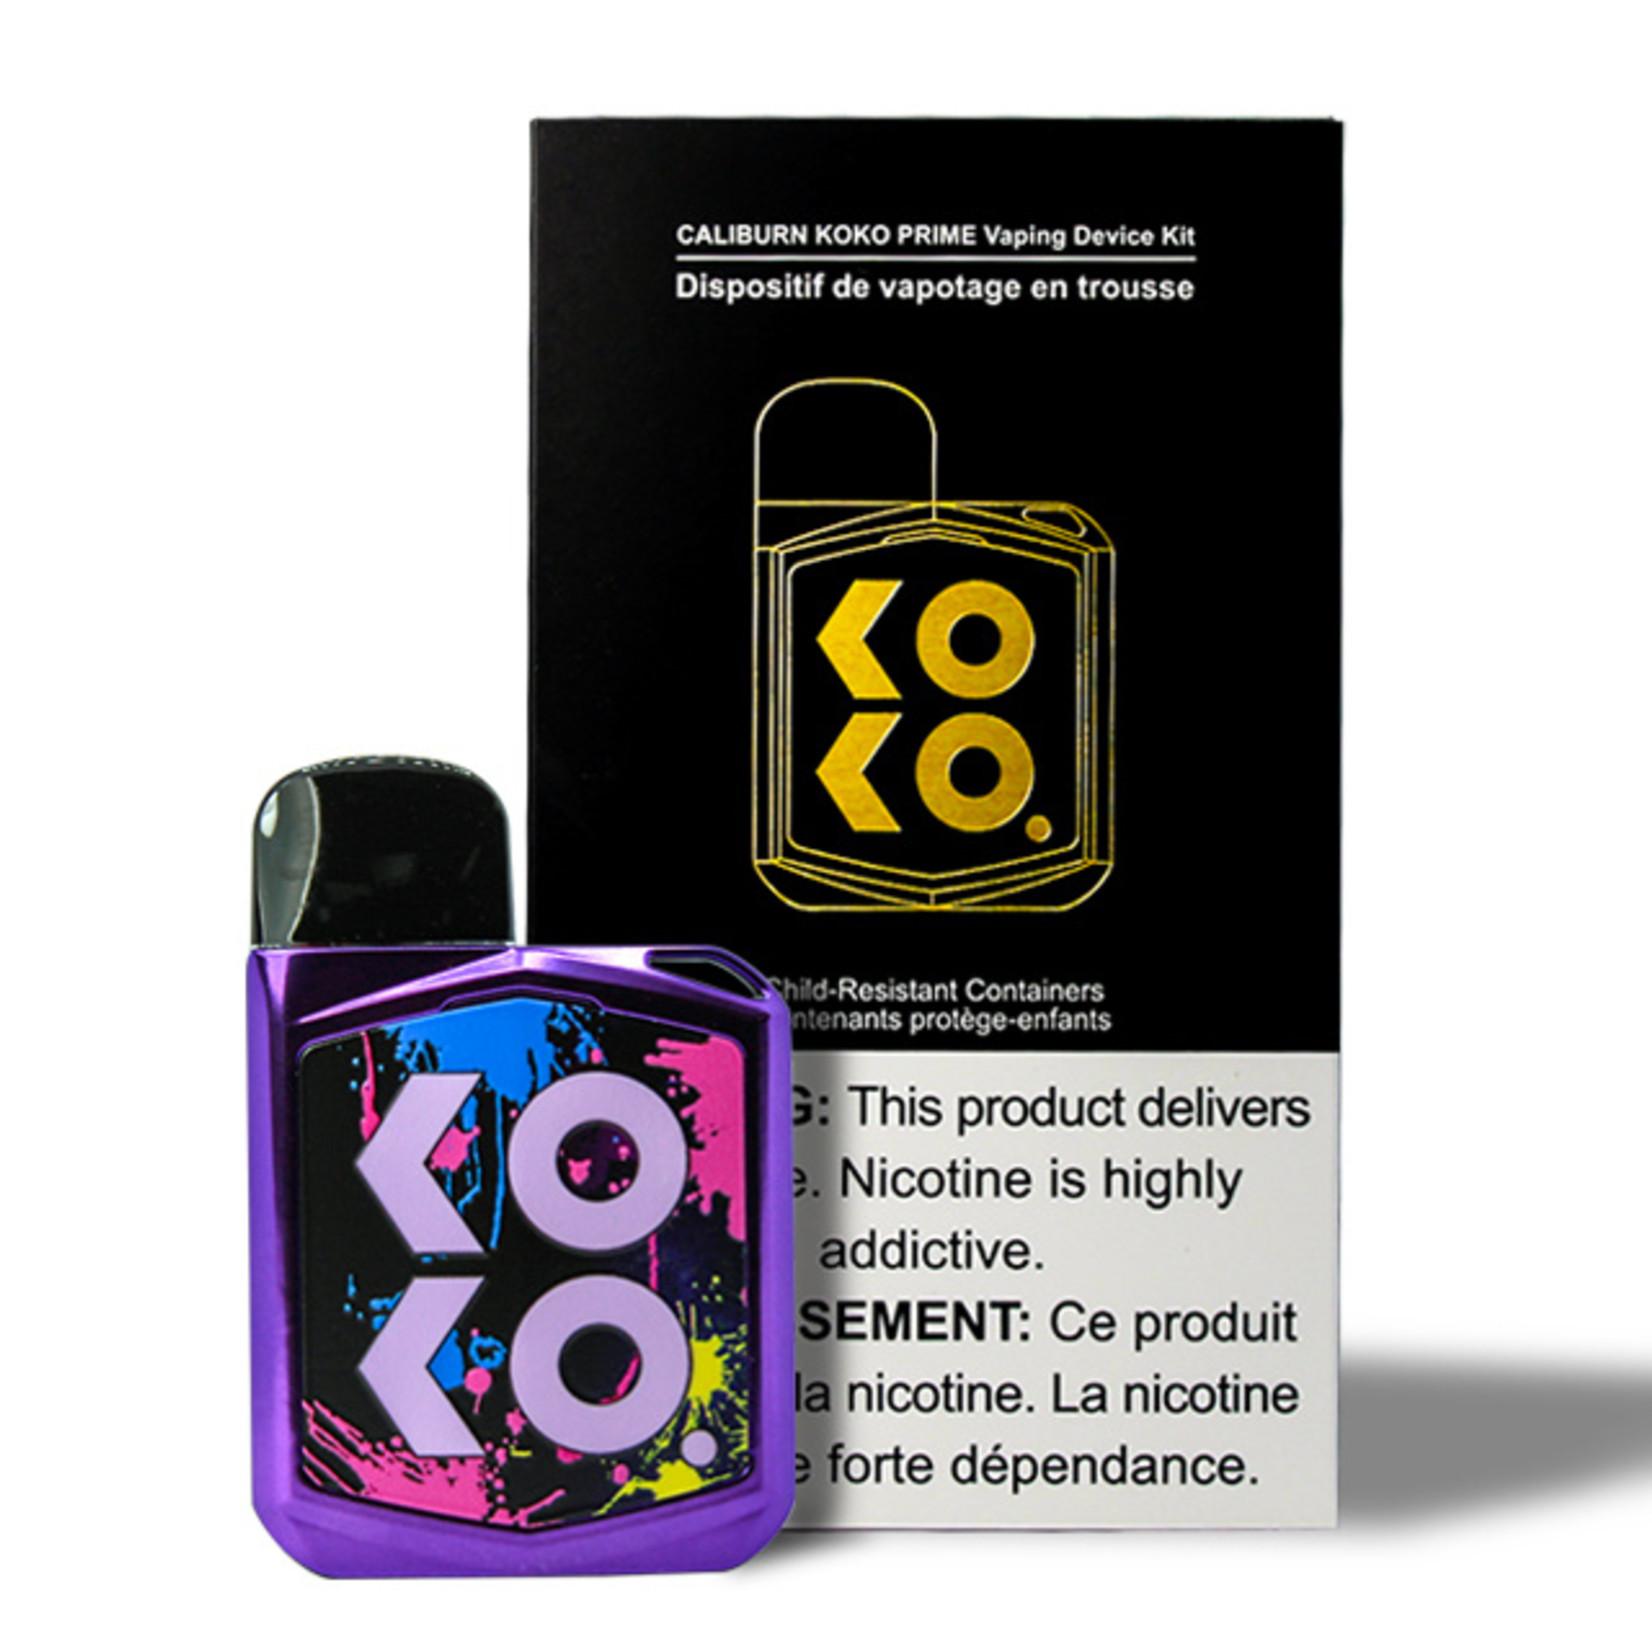 CRC Uwell Caliburn Koko Prime Pod Kit